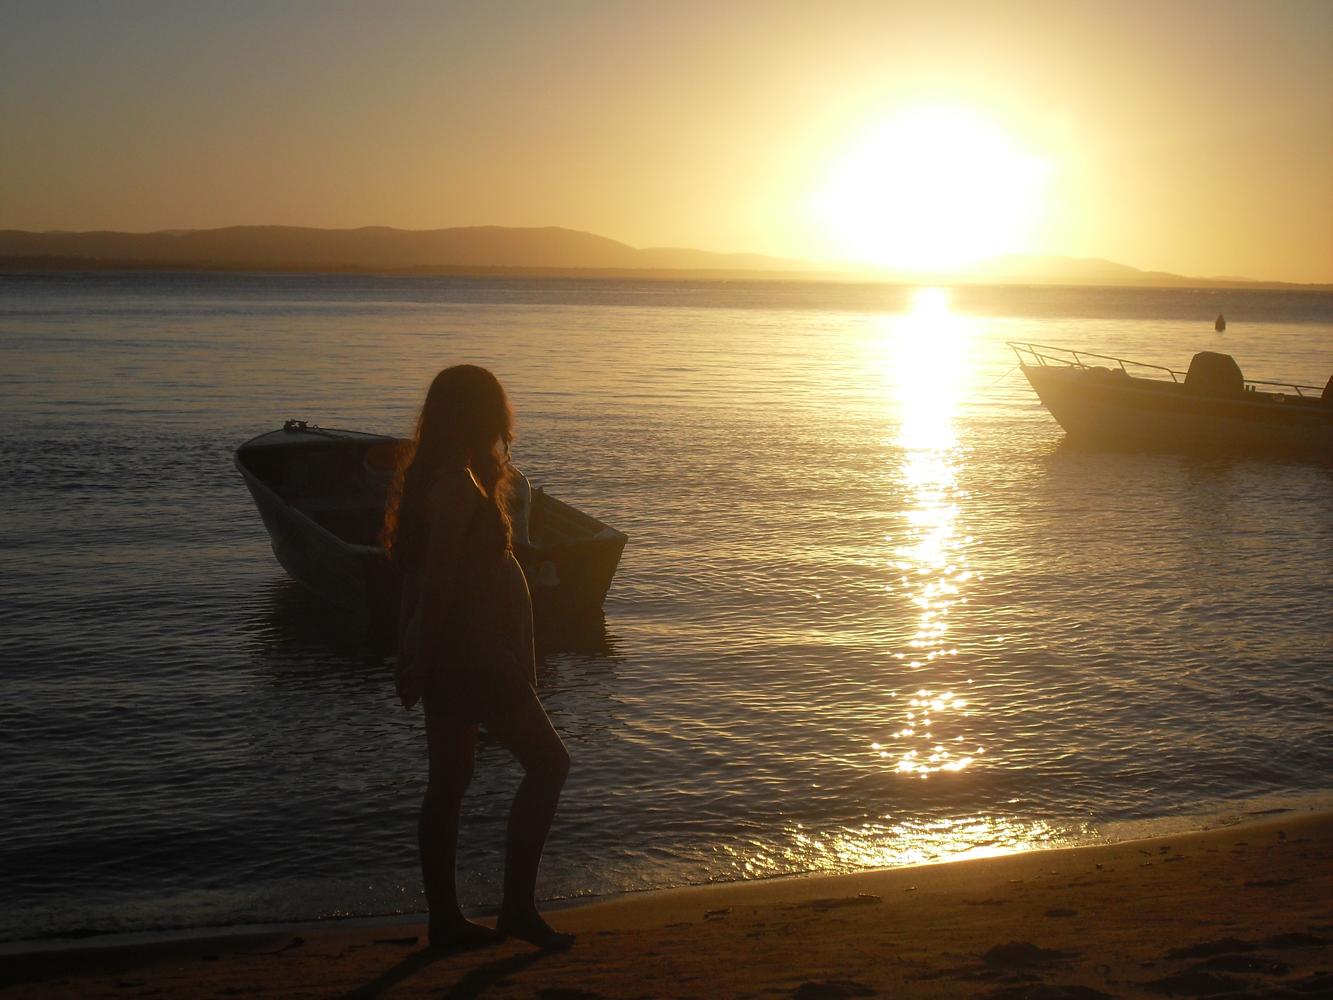 Sunset, Beach, Boats, Girl, Landscape, HQ Photo